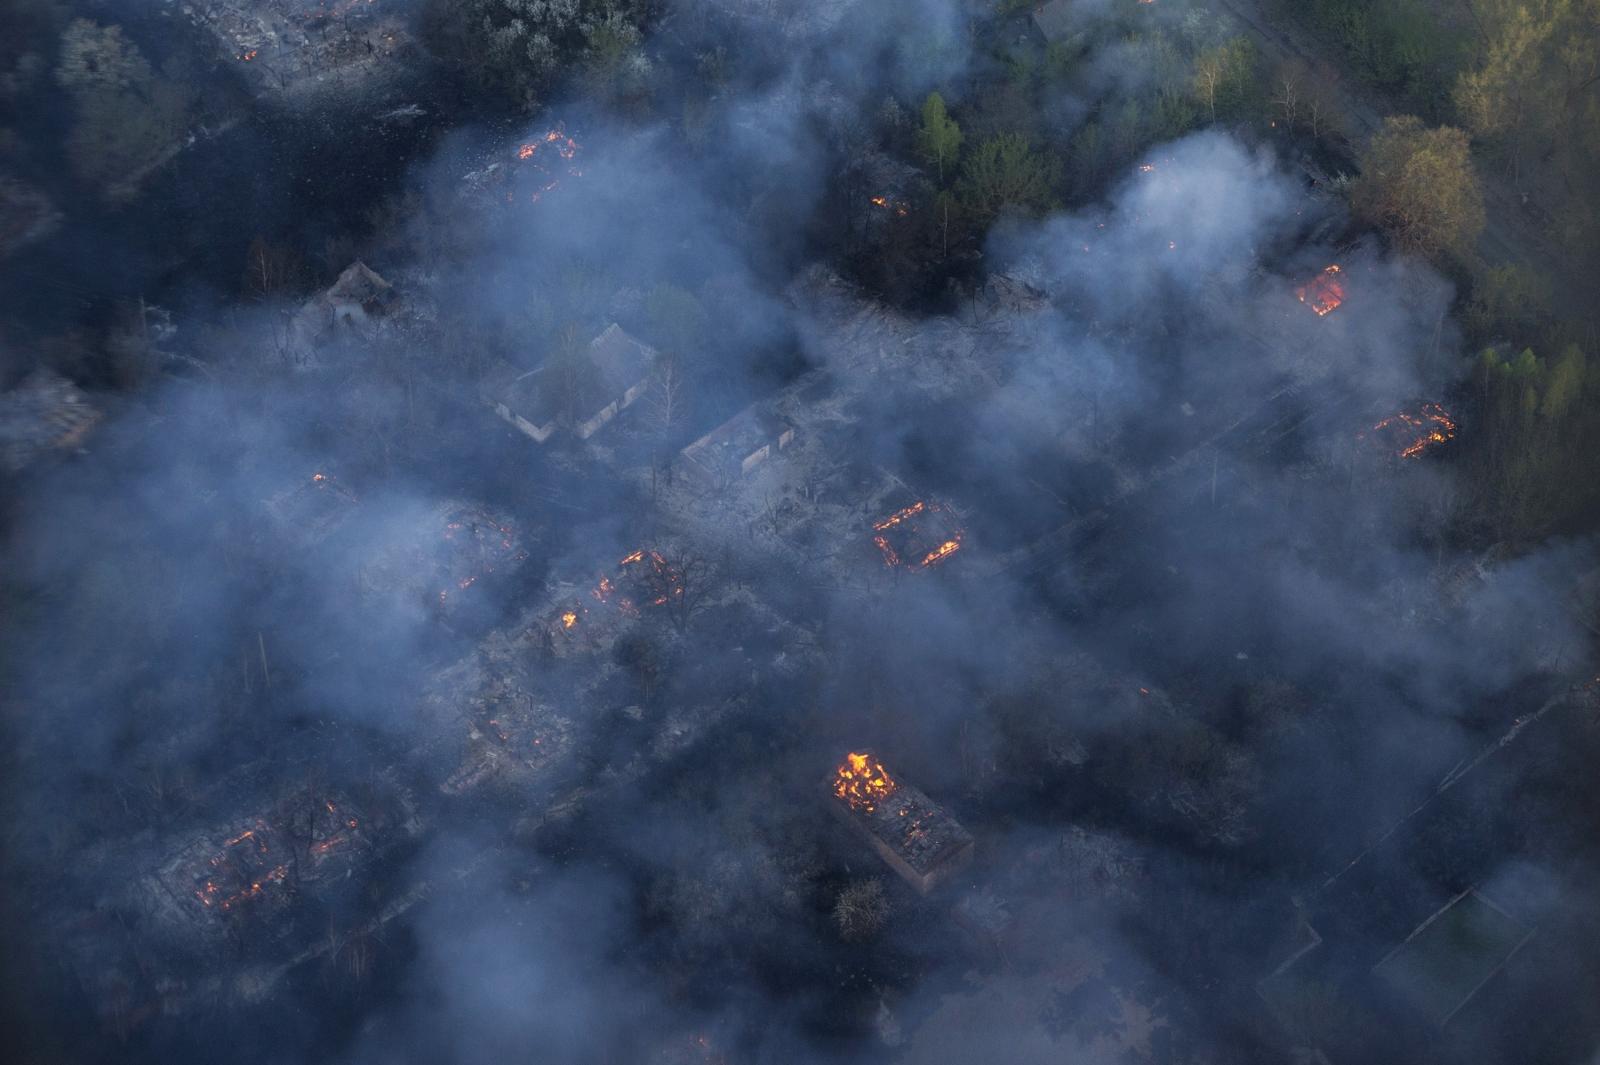 Ukraine blaze nears Chernobyl nuclear disaster zone